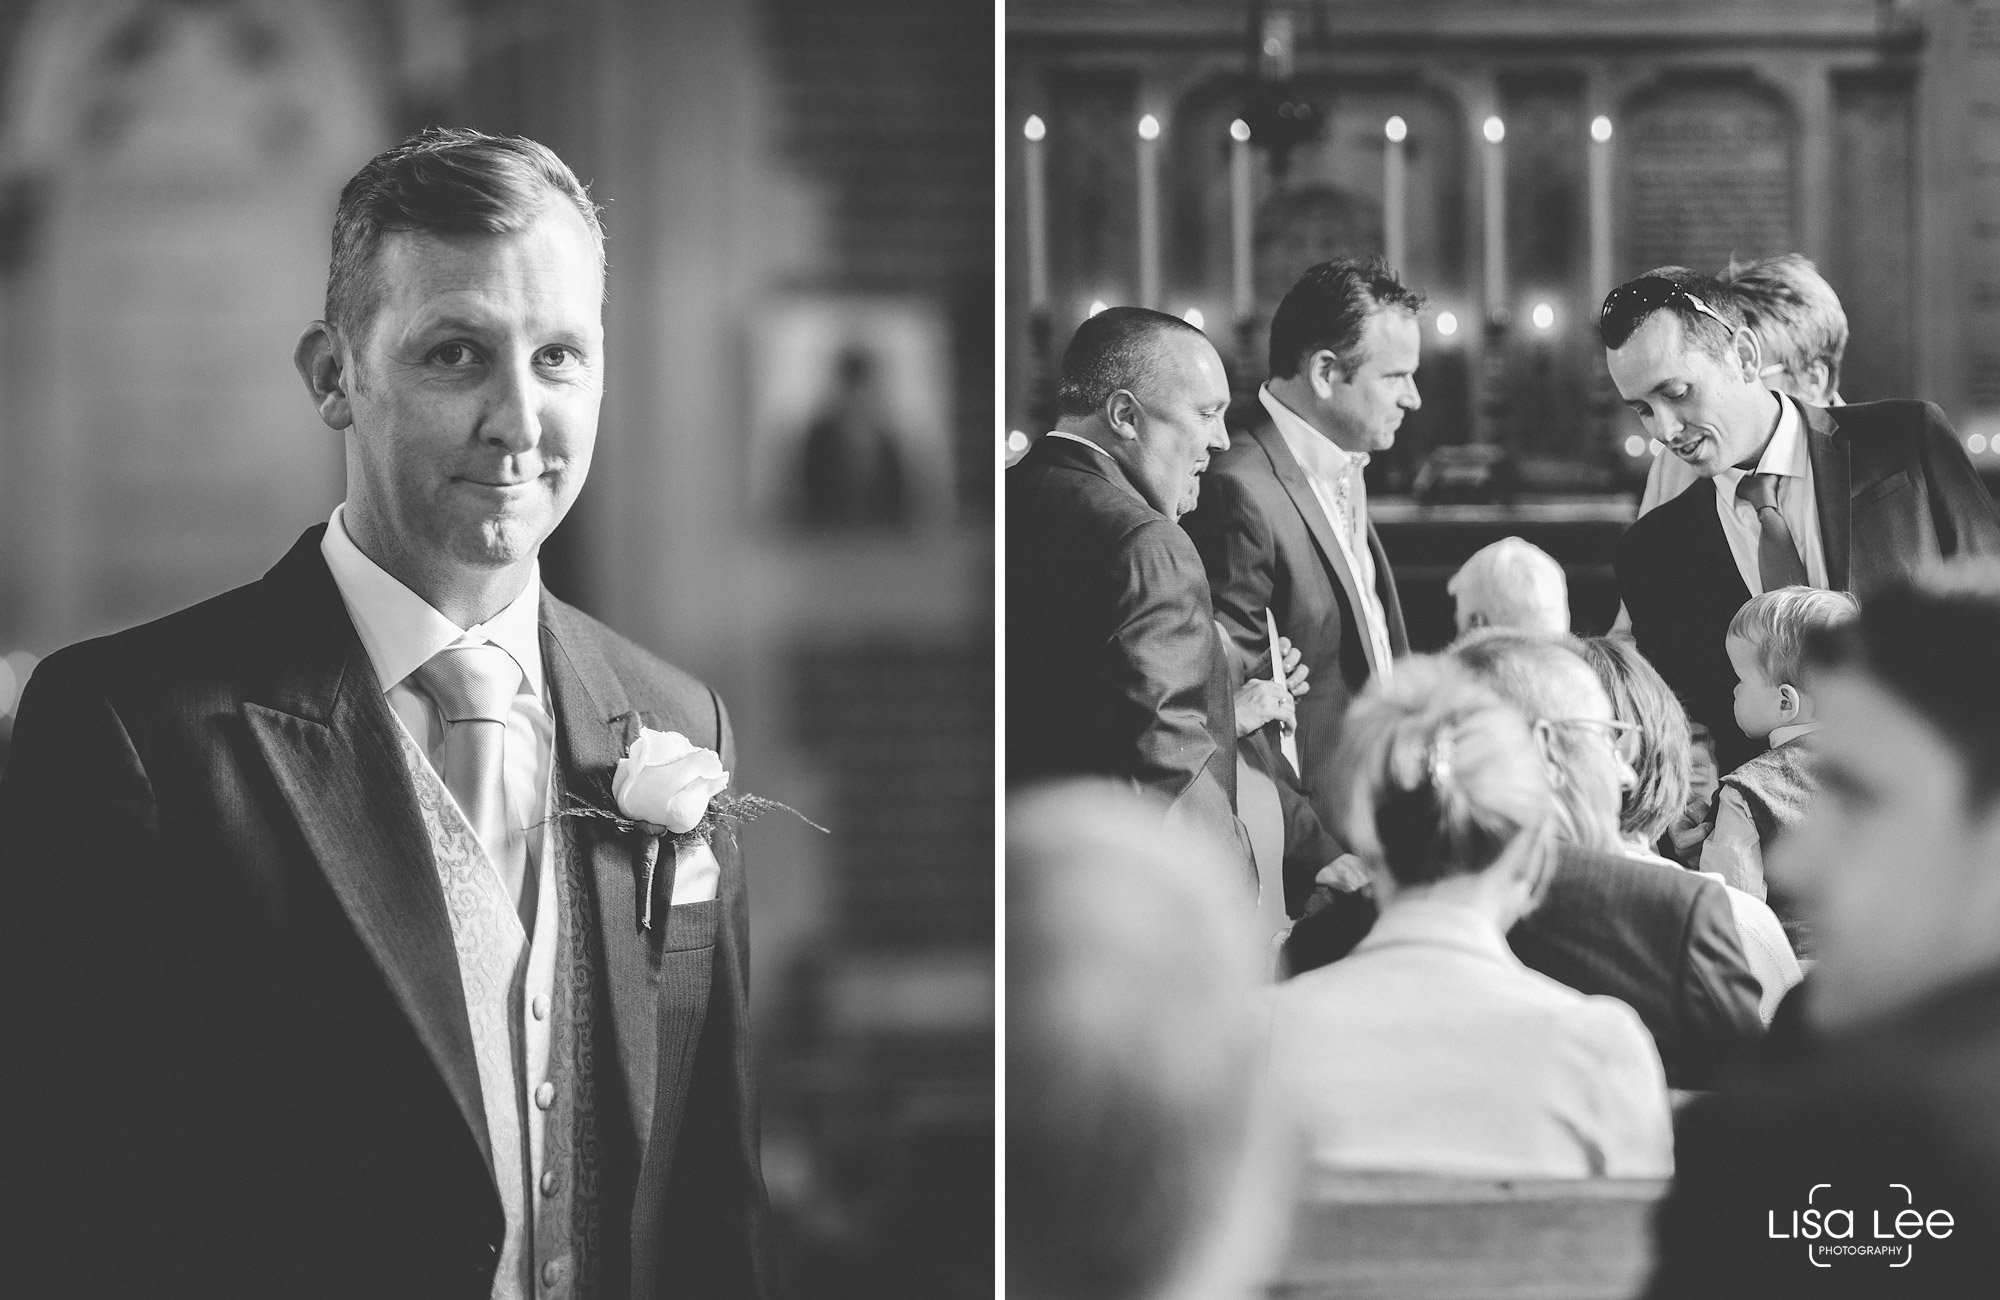 lisa-lee-wedding-photography-burton-groom.jpg